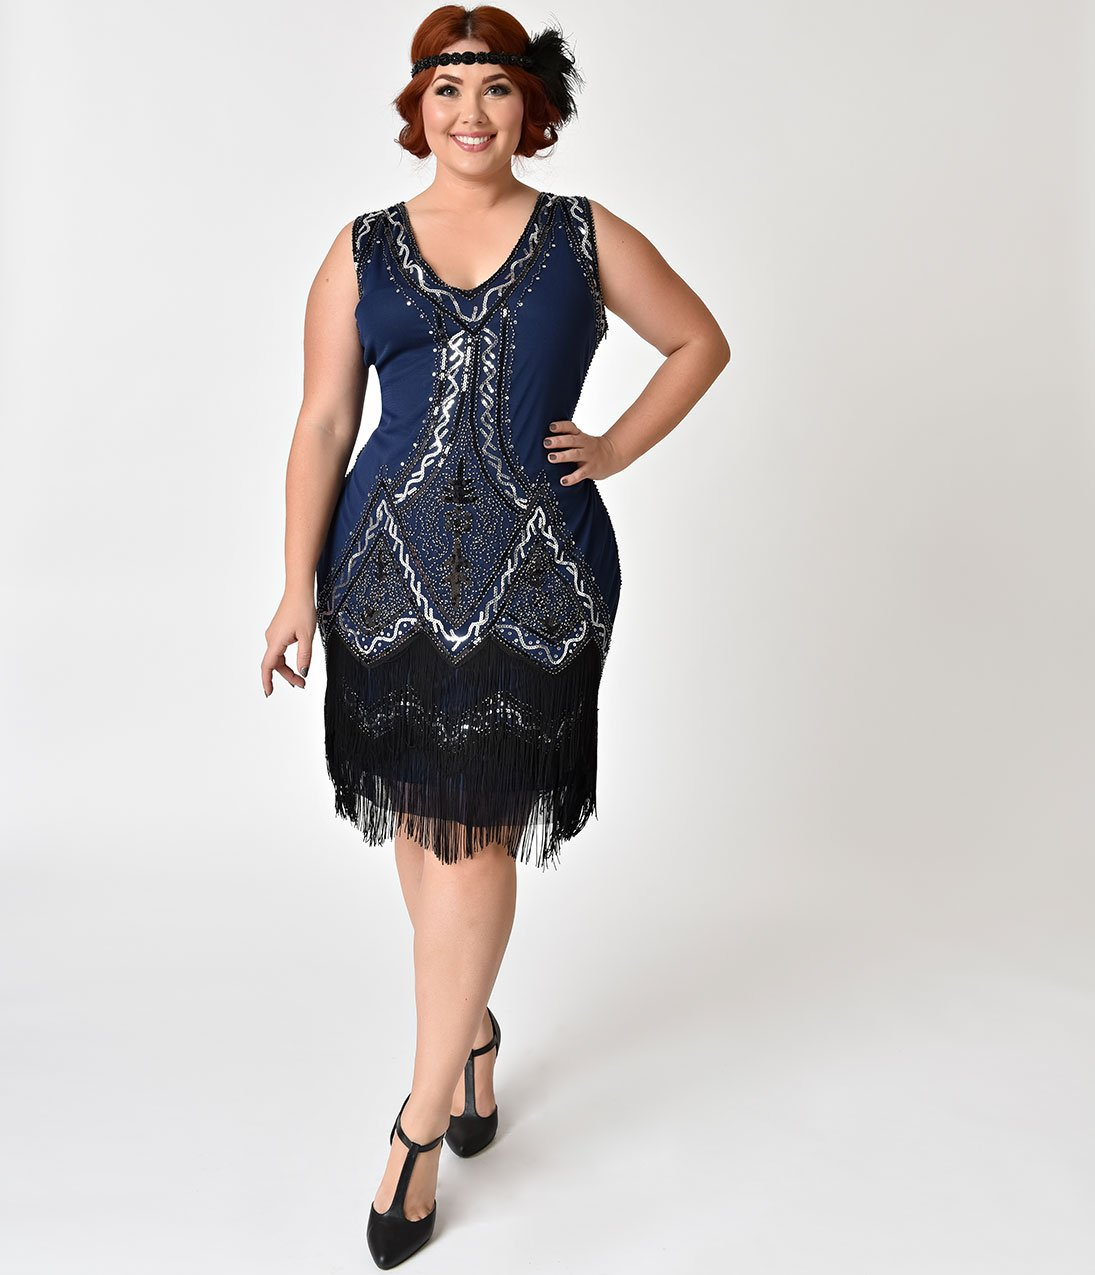 Plus size s style navy blue beaded sylvie flapper dress s